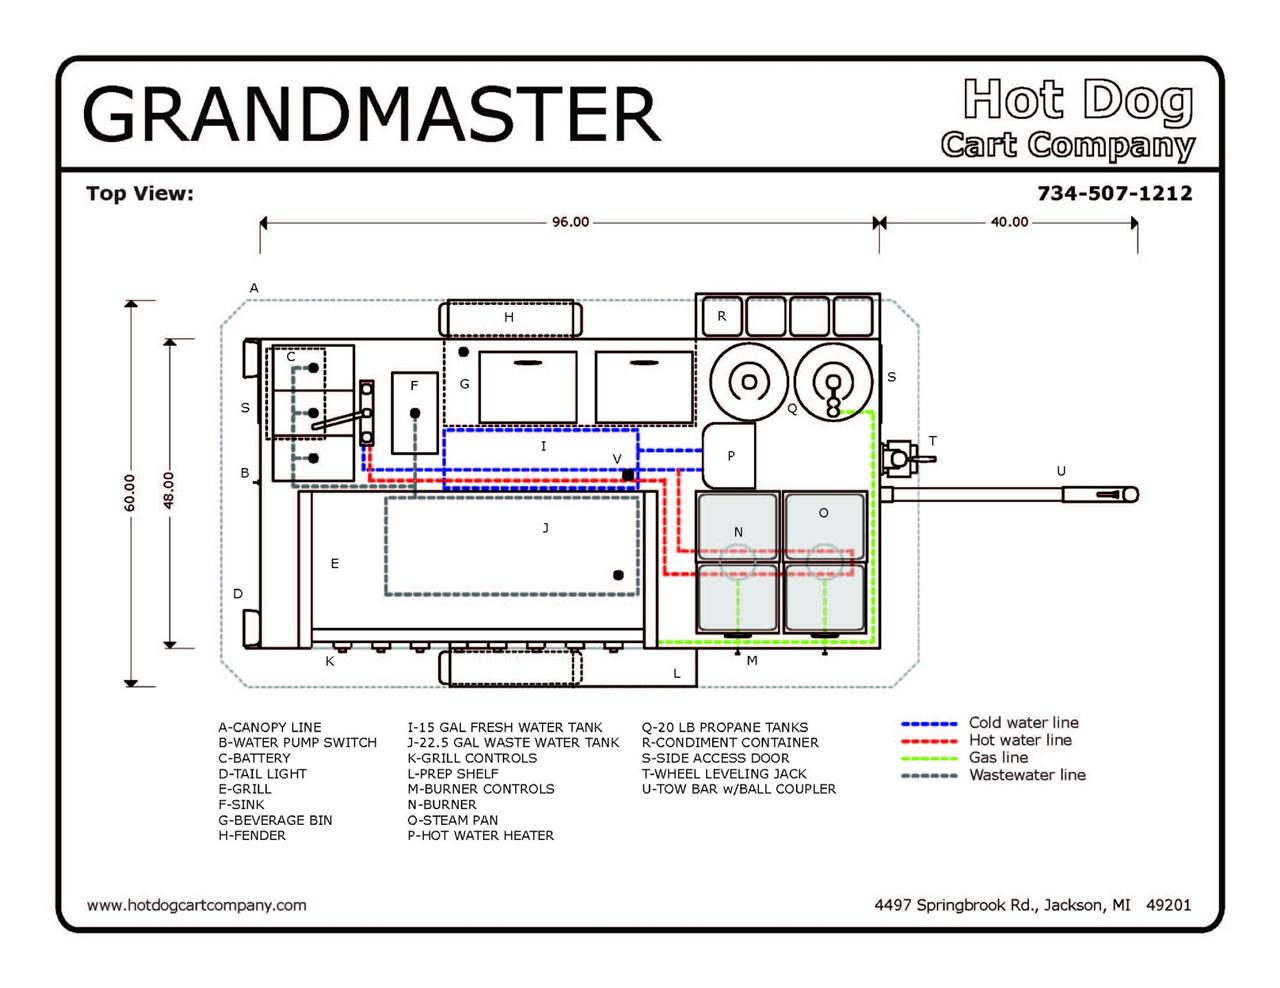 Grand Master Hot Dog Cart Vending Concession Trailer Ebay